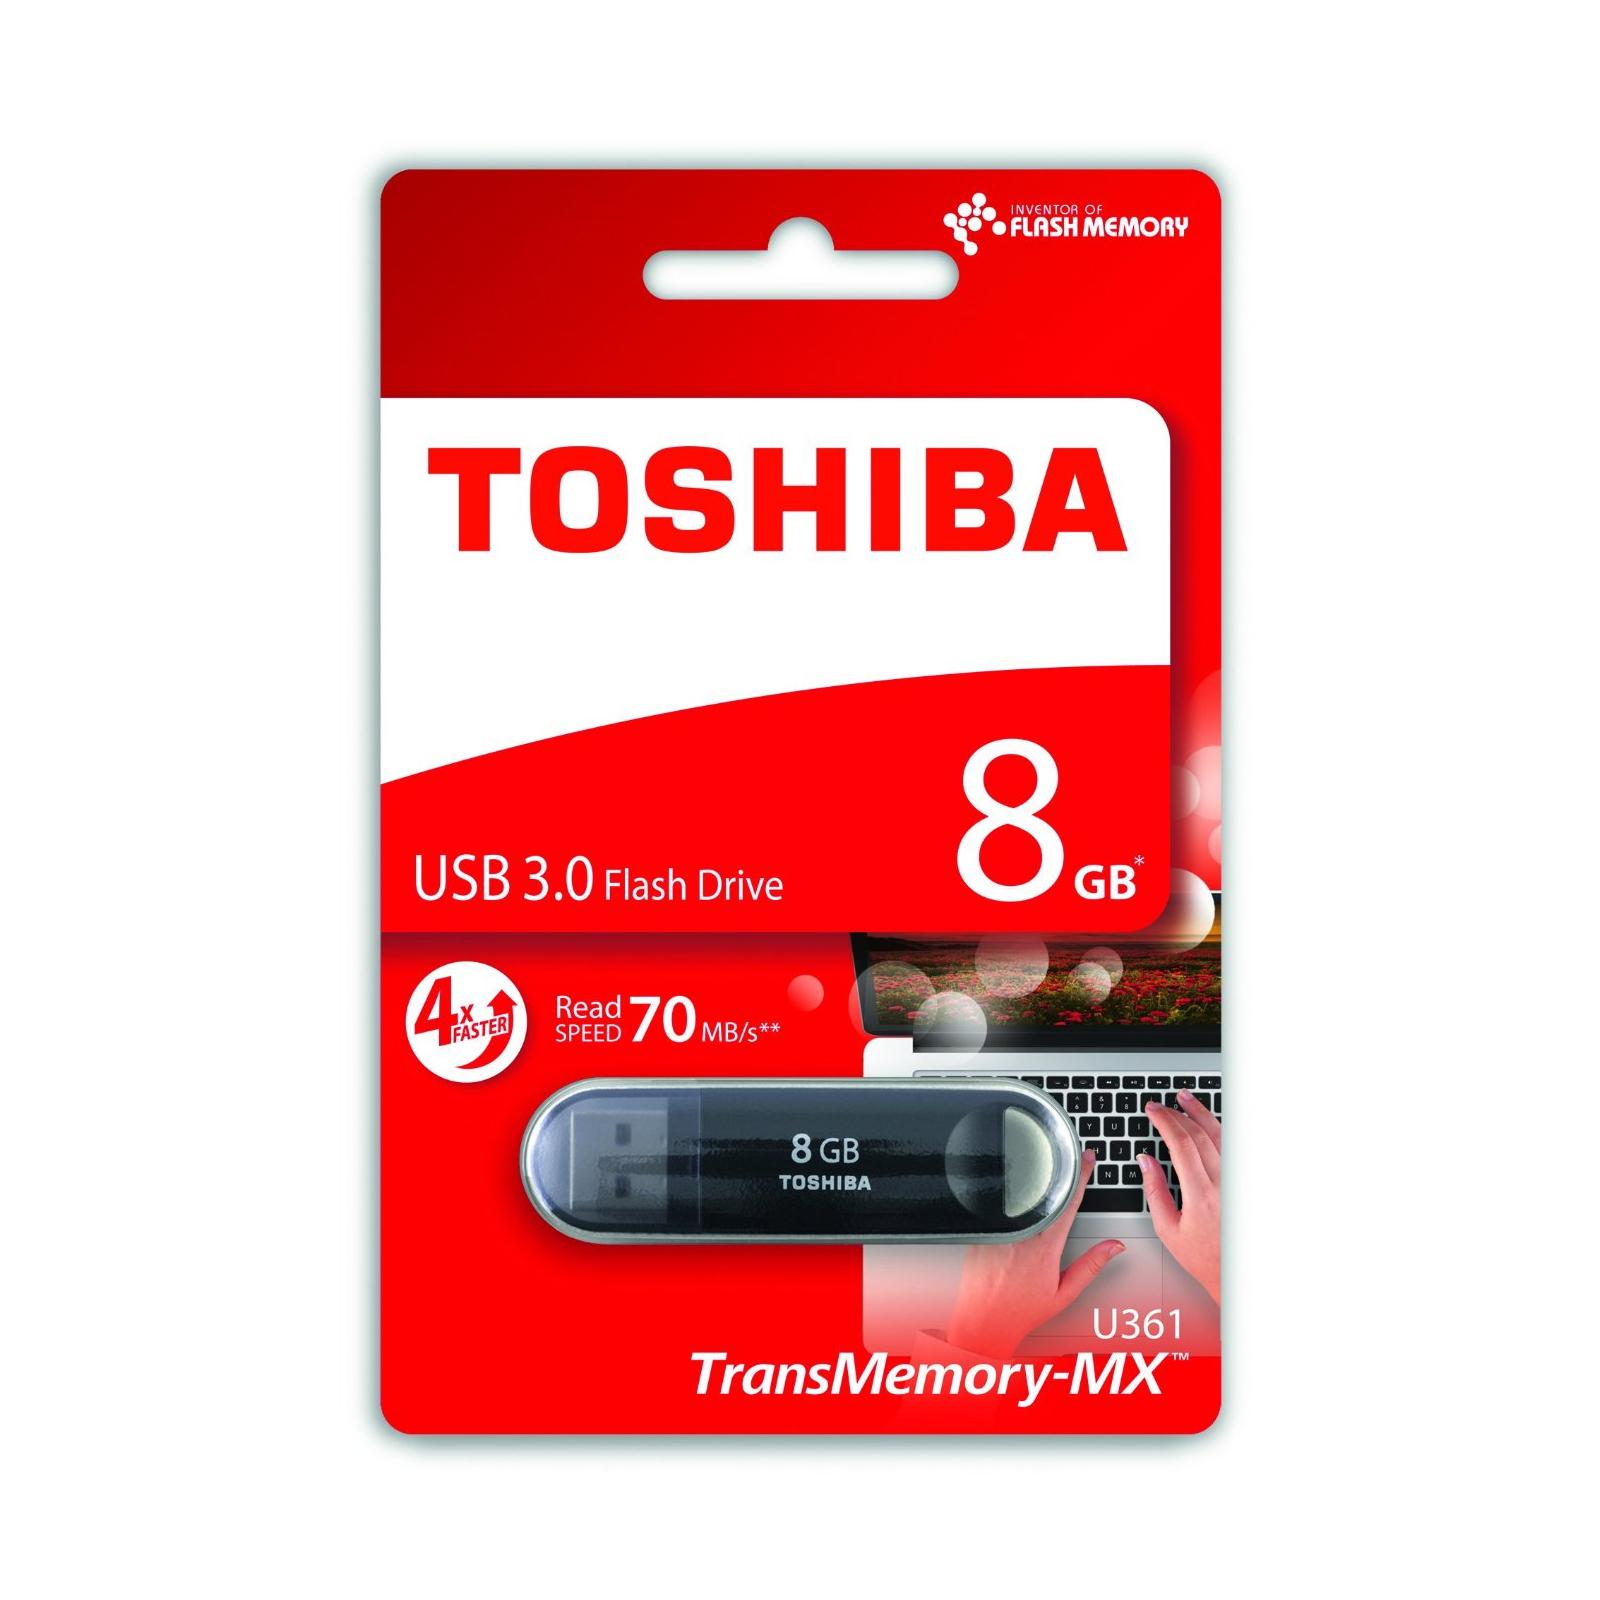 USB флеш накопитель Toshiba 8GB Suzaku Black USB 3.0 (THN-U361K0080M4) изображение 2